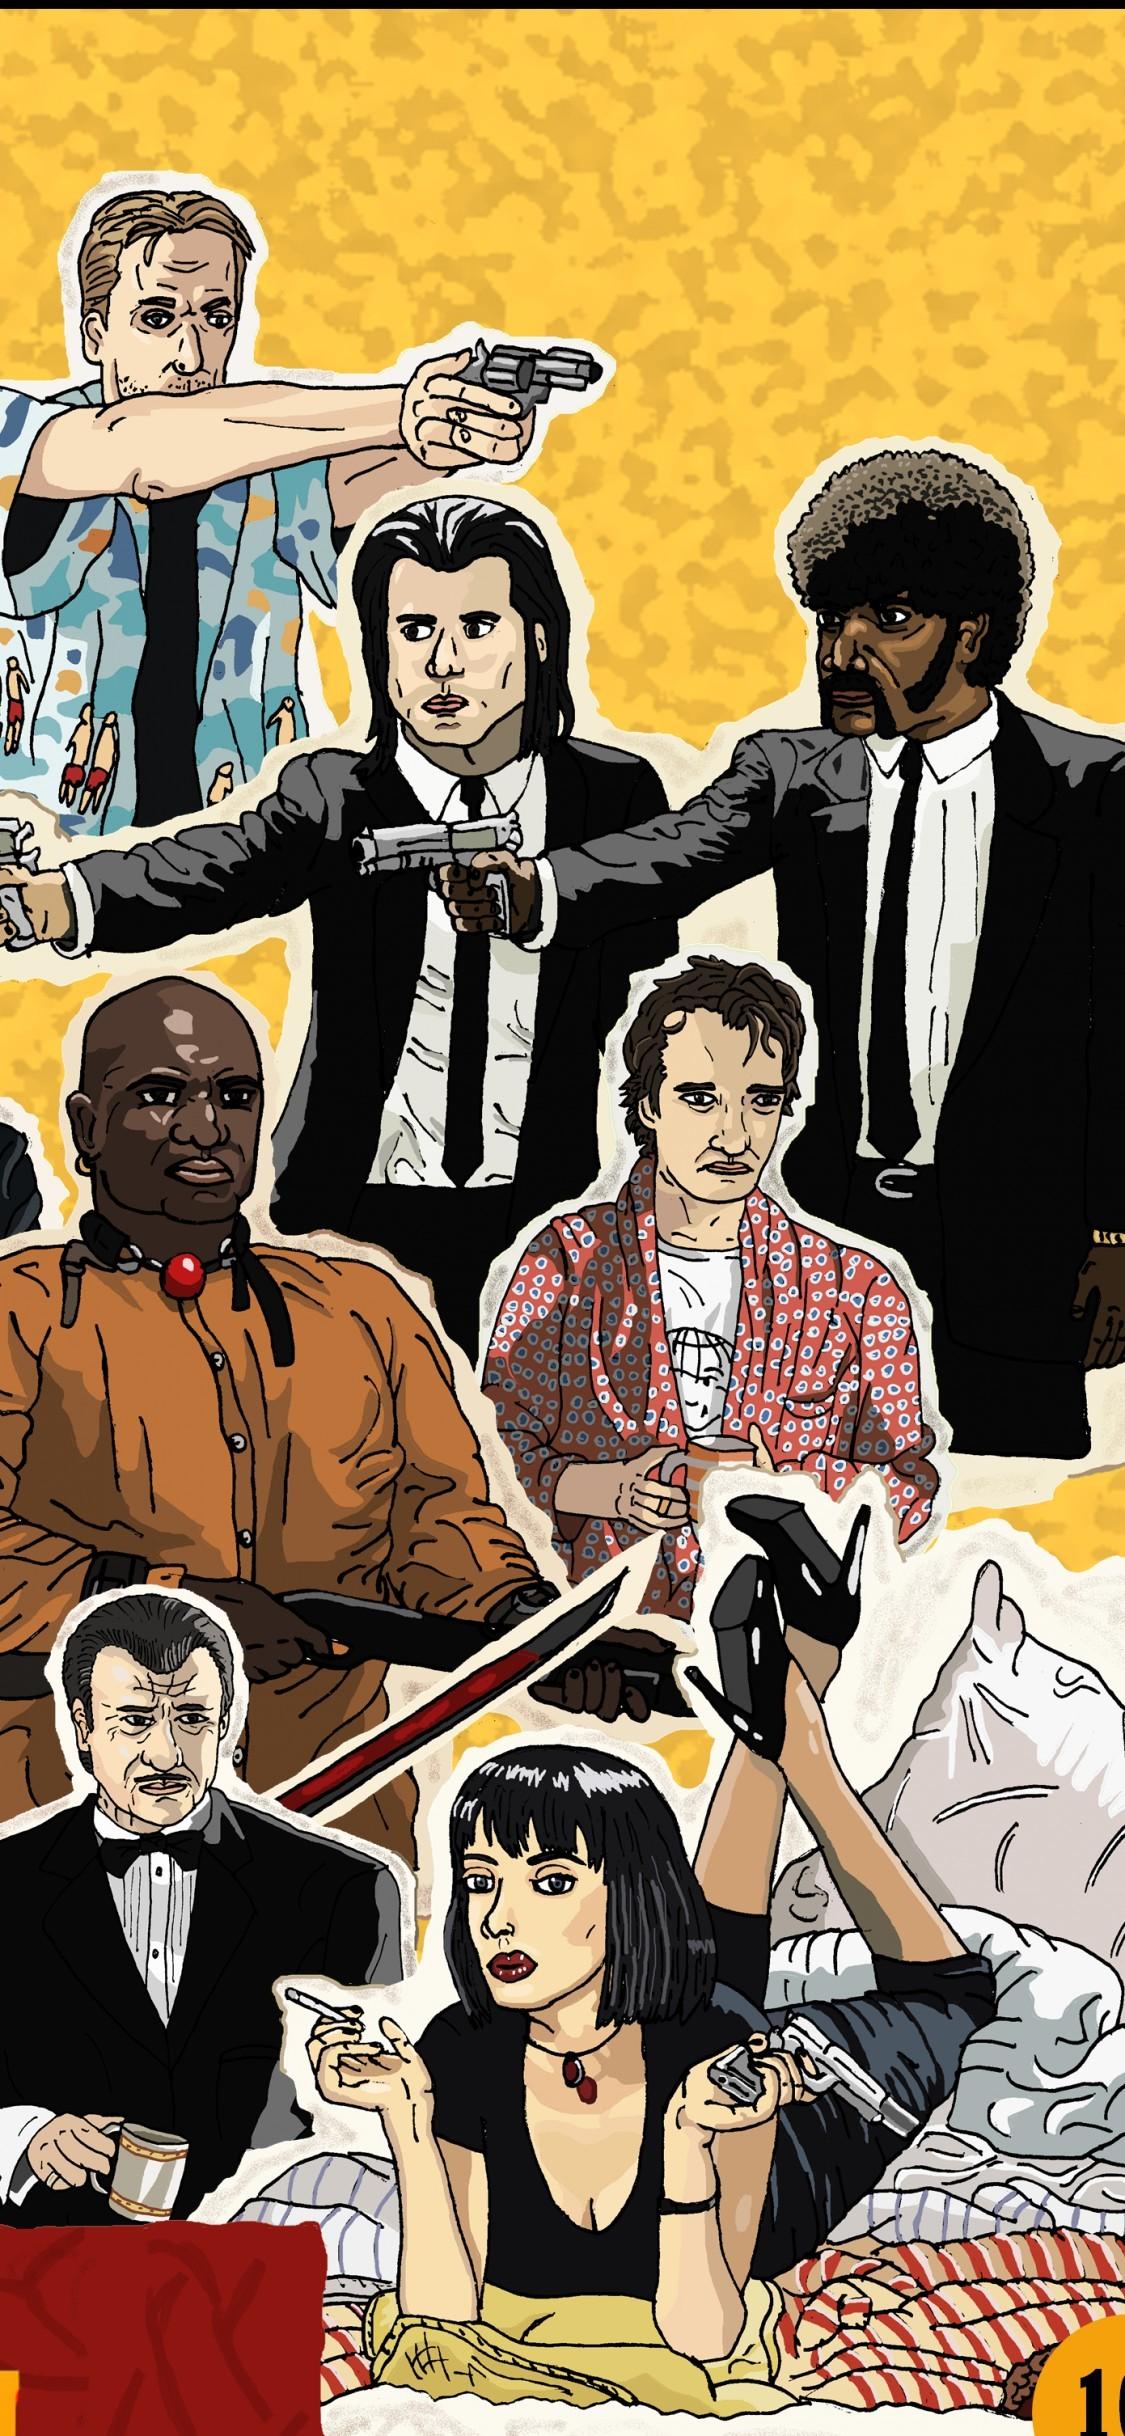 Pulp Fiction Wallpaper Iphone - Best Wallpapers